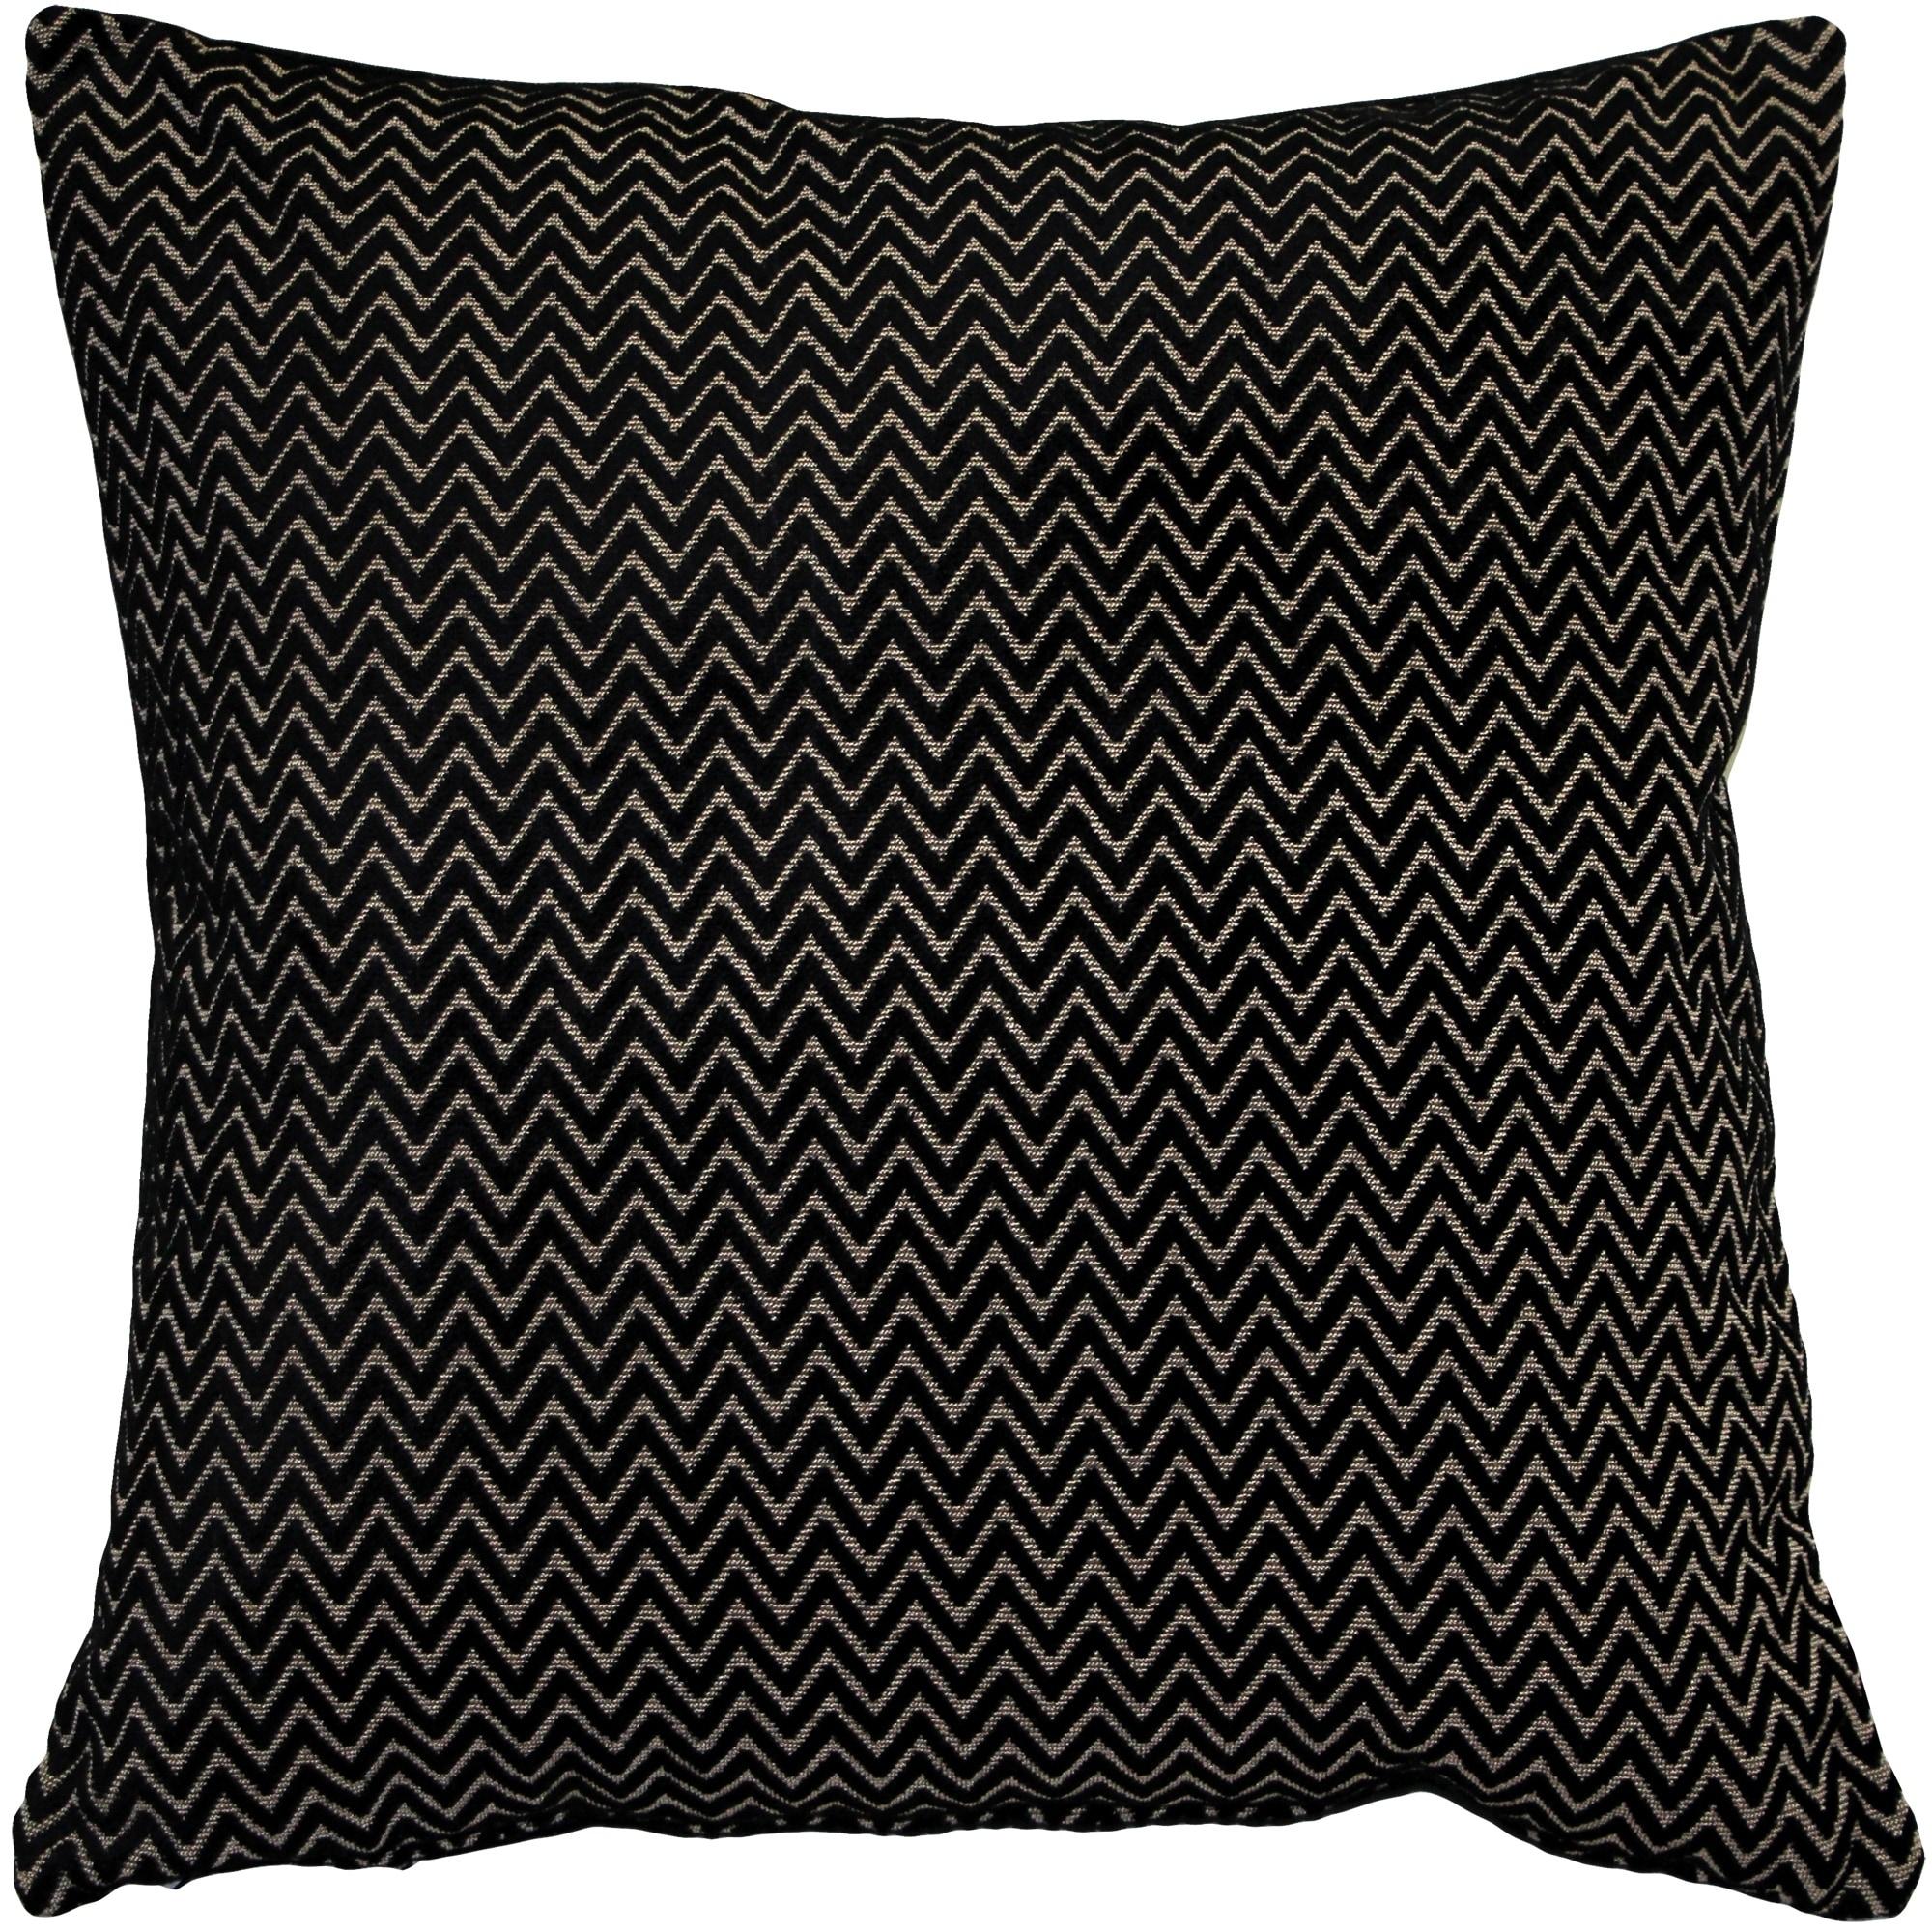 Pillow Decor - Art Deco Stripes Velvet Throw pillow 20x20